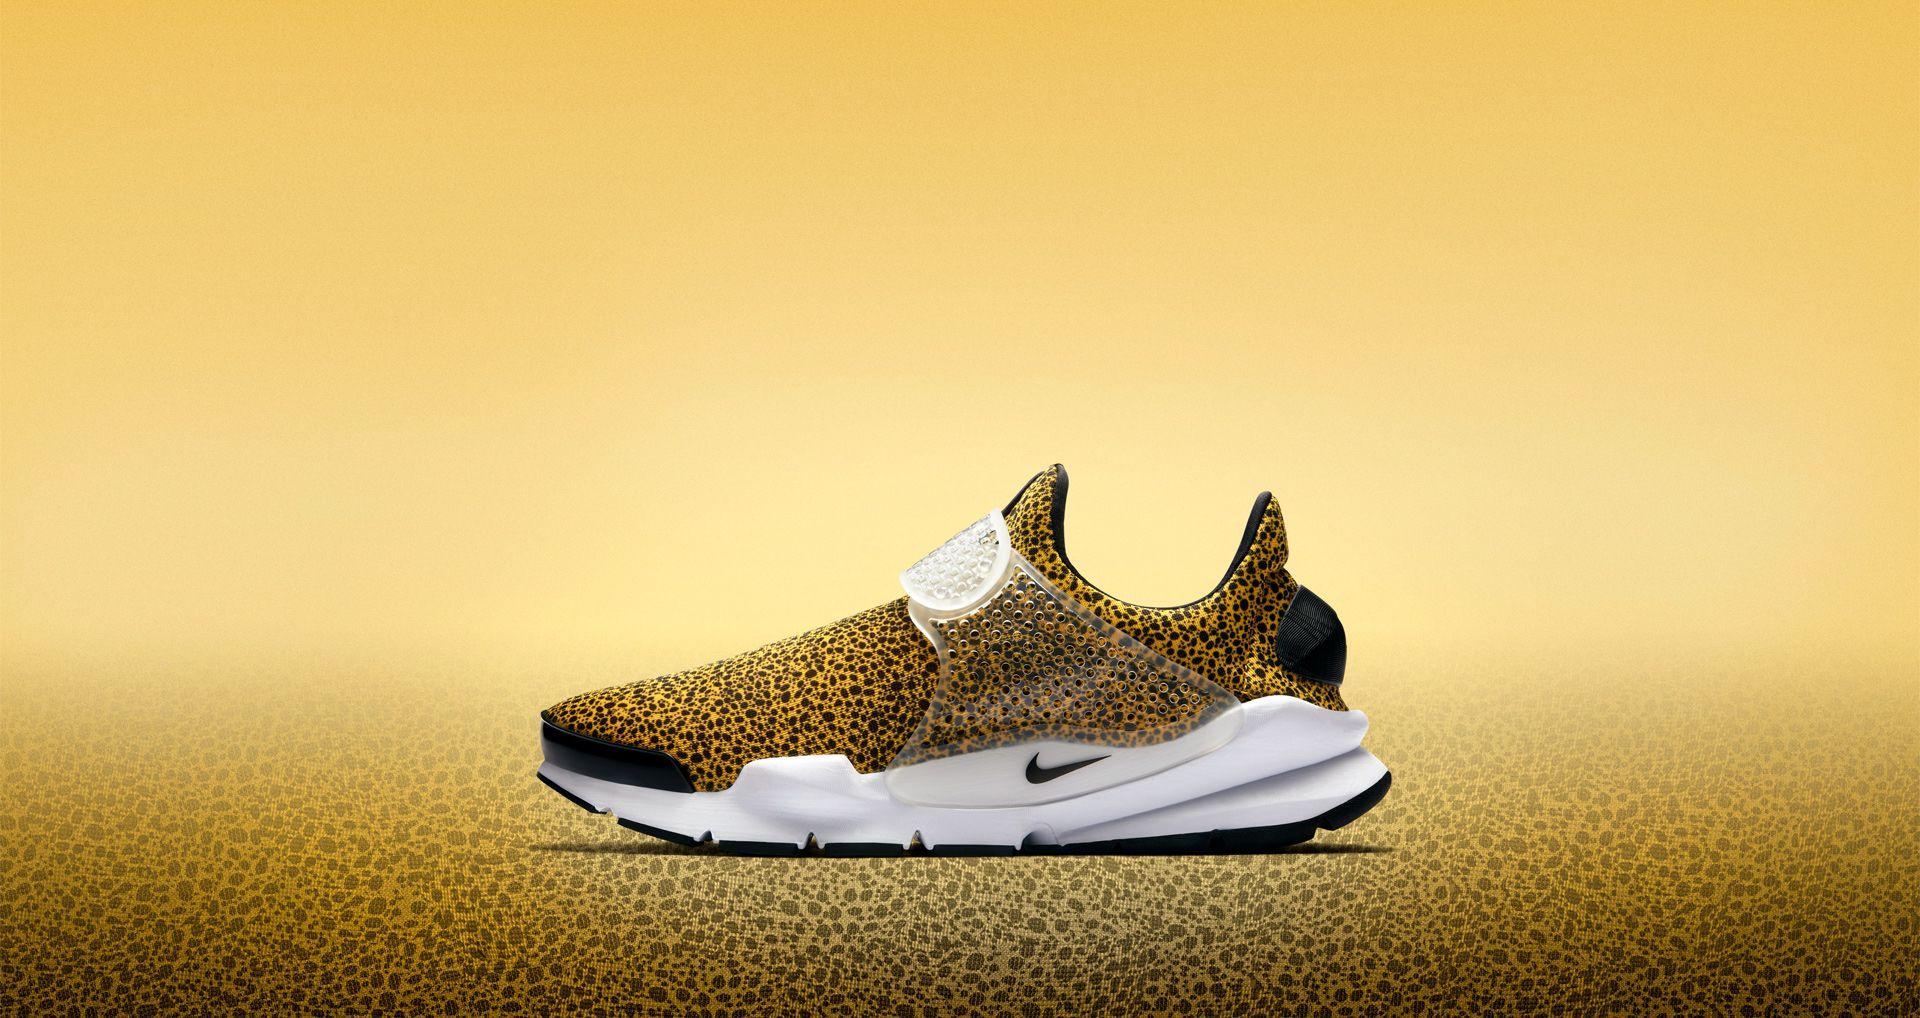 online store dcad5 7d1b8 Nike Air Sock Dart 'University Gold' Safari 2017. Nike+ SNKRS